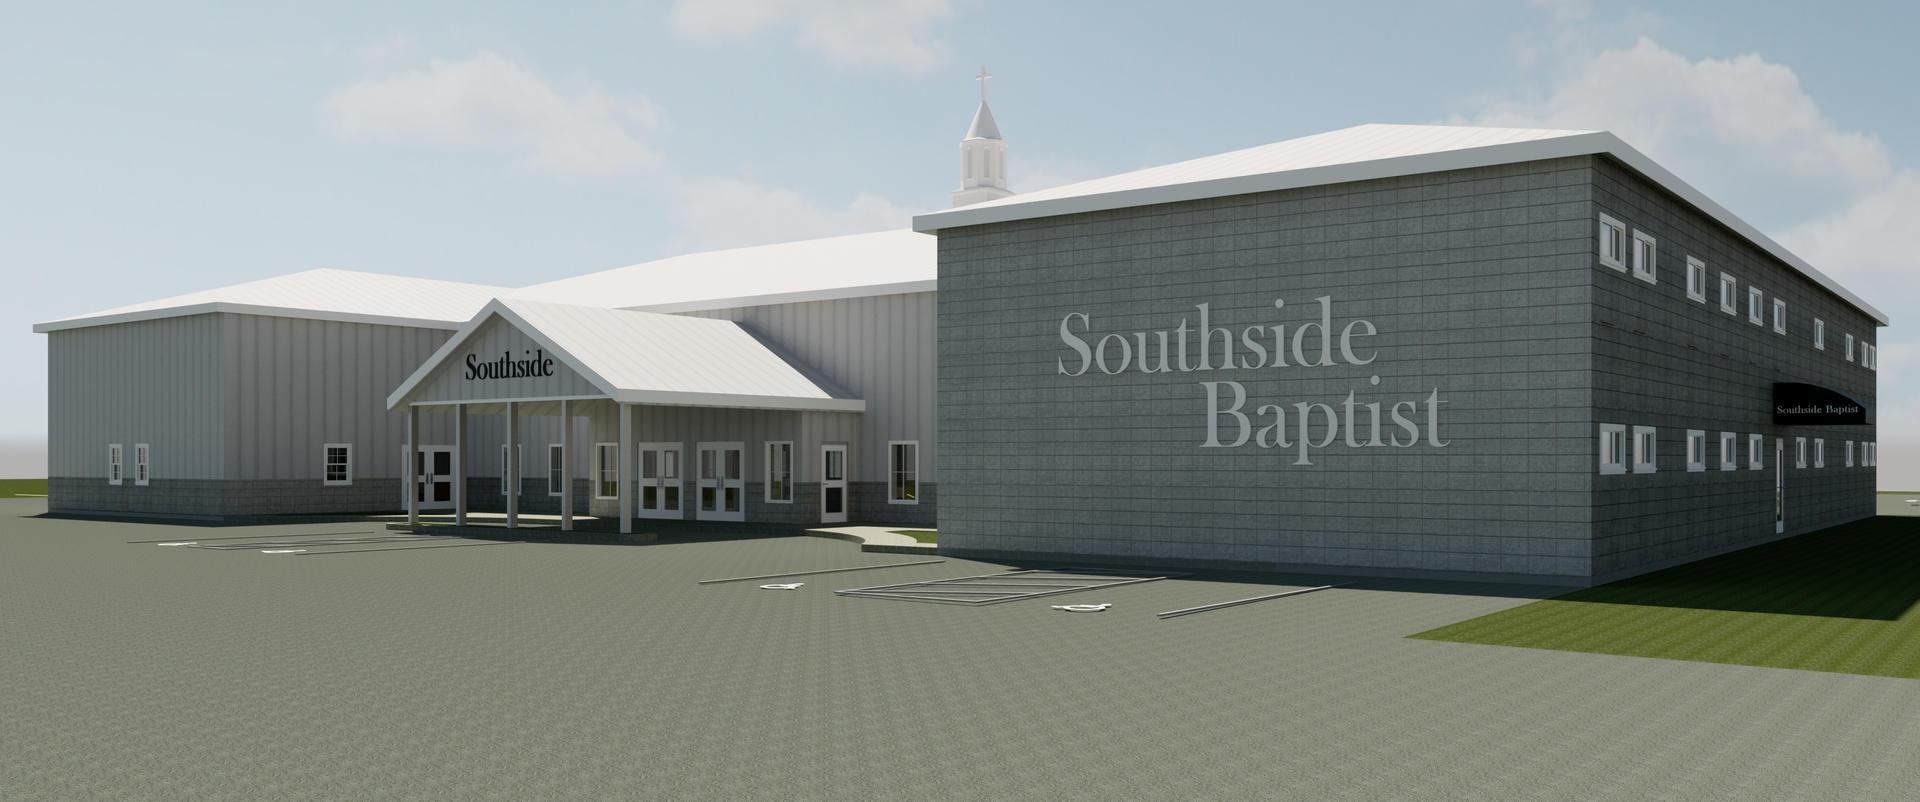 Southside Baptist Exterior